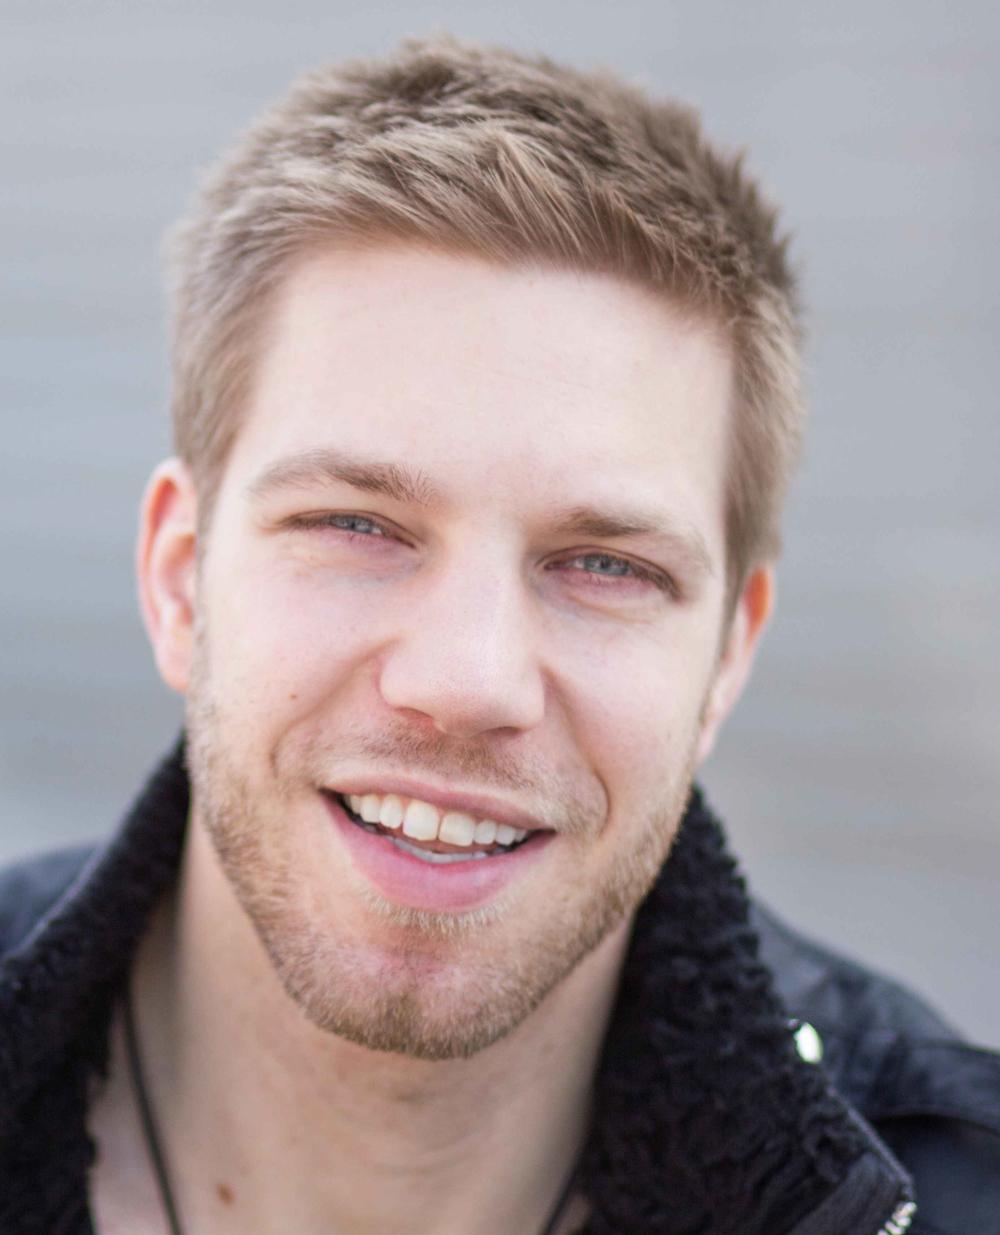 Kyle Rea Portrait - Oren Rehany